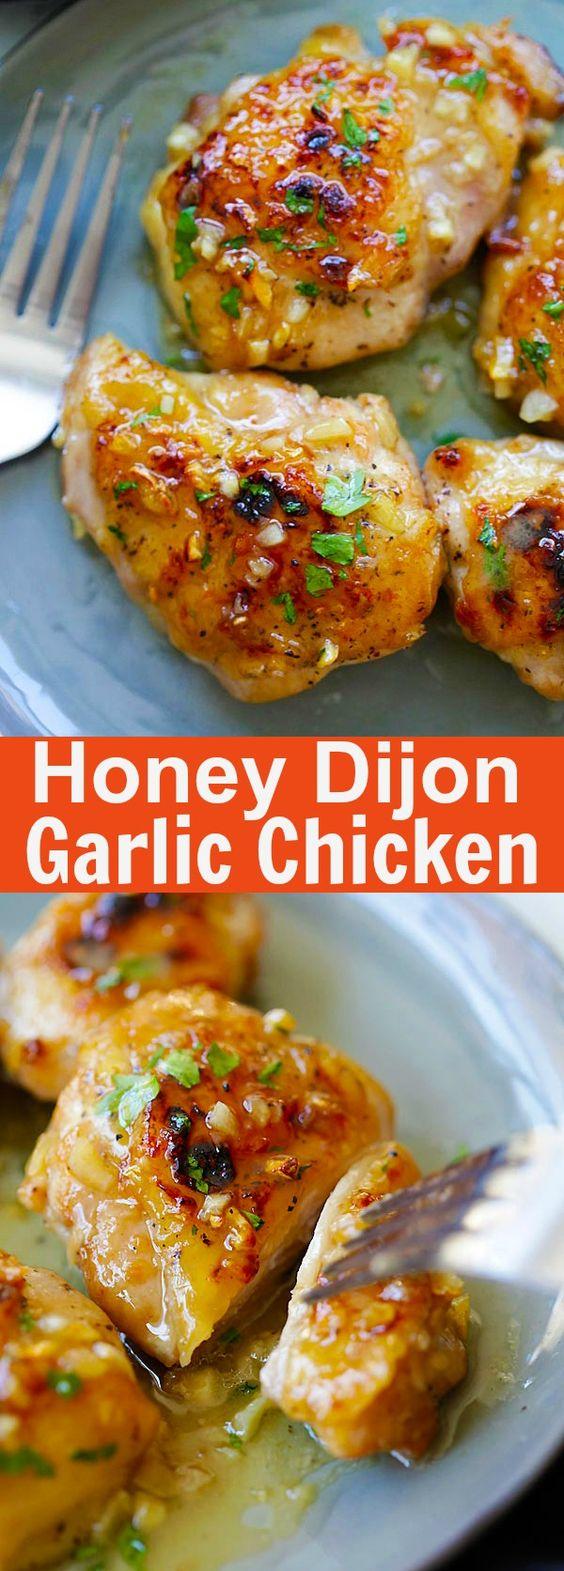 Amazing Honey Dijon Garlic Chicken Recipe